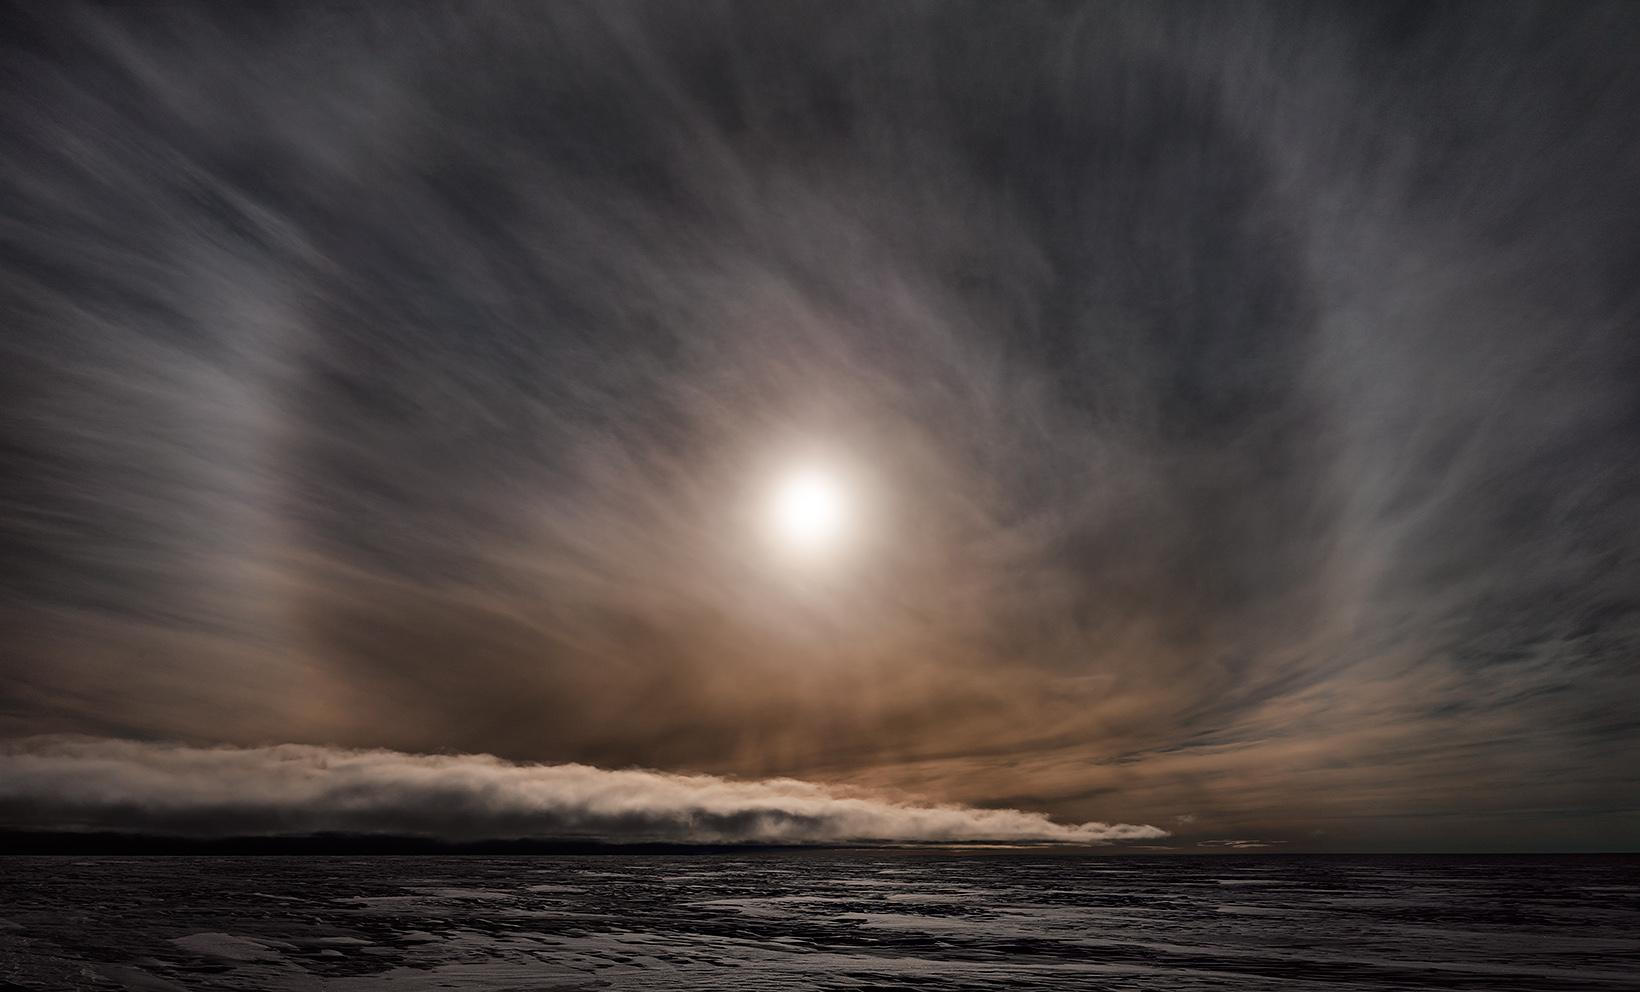 MURRAY FREDERICKS     Icesheet #2564, late sun with 22˚ halo  2013 digital pigment print, edition of 7 120 x 198 cm